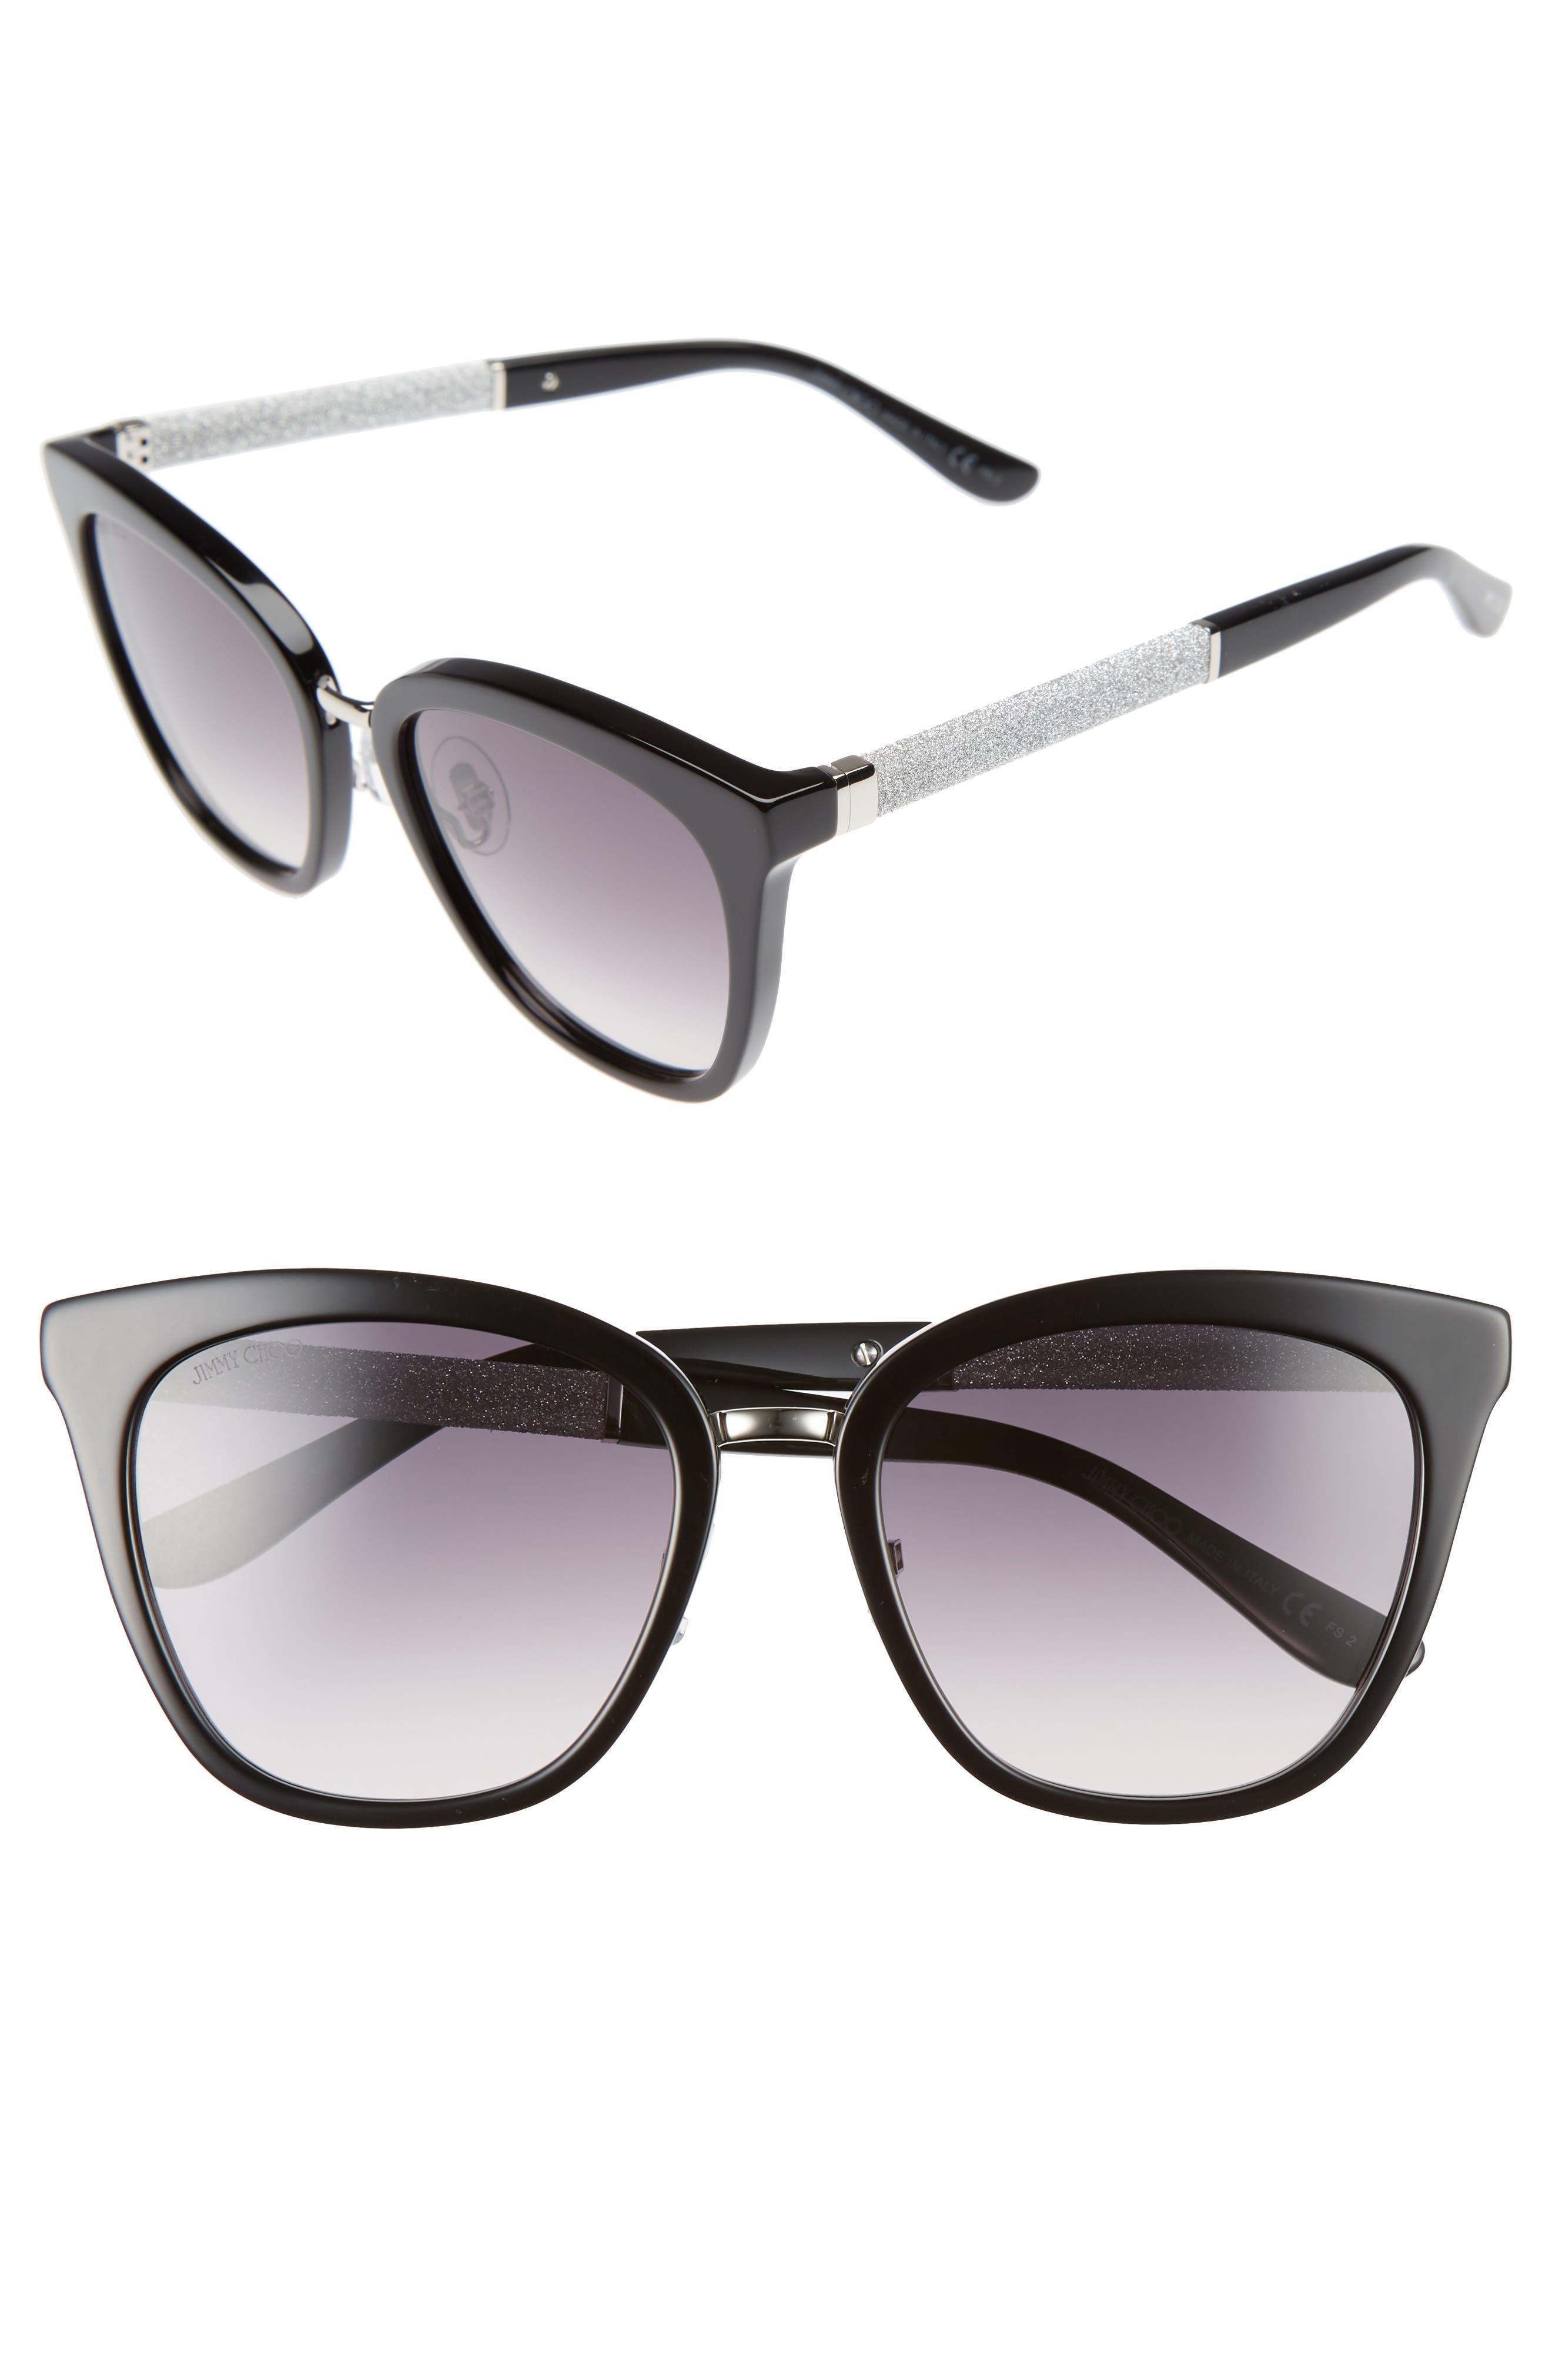 Fabry 53mm Sunglasses,                             Main thumbnail 1, color,                             001